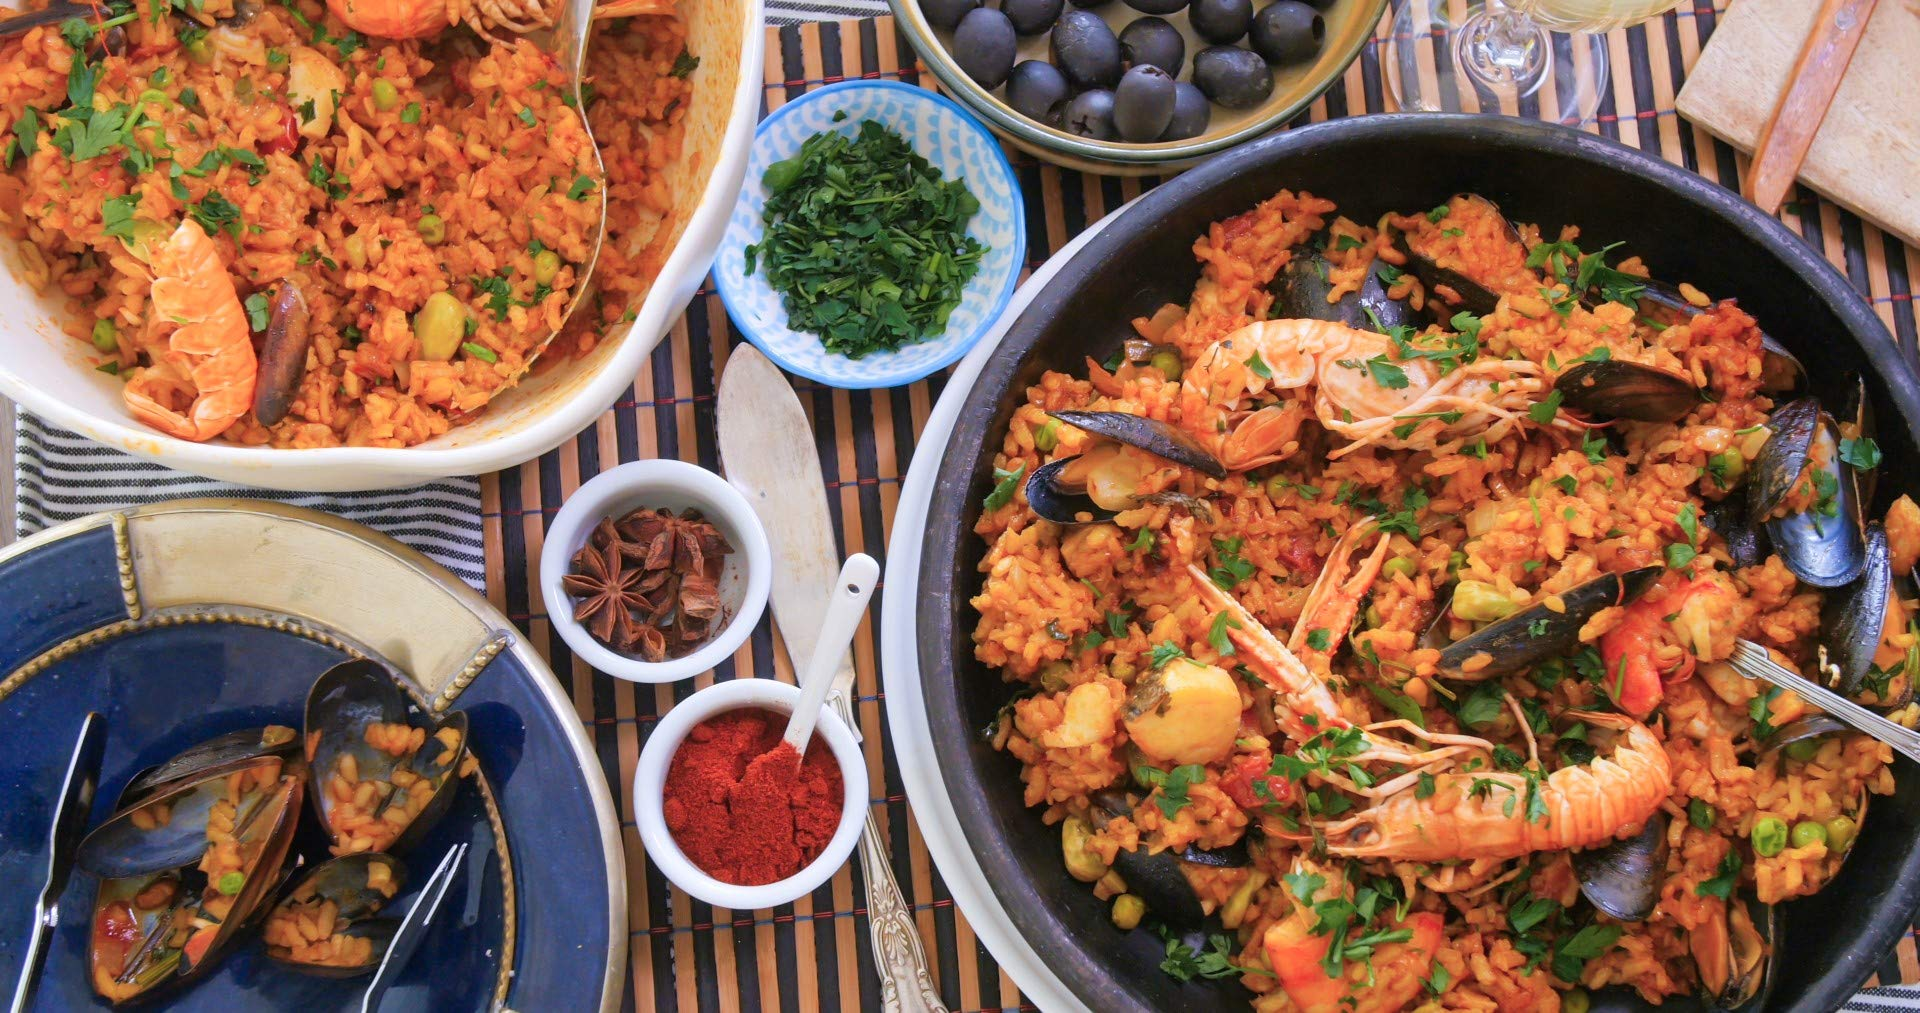 Mari Paz | Spanish Paella Seasoning with Saffron | 31.75oz. | 900grs. | Pack Of 1 by Mari Paz